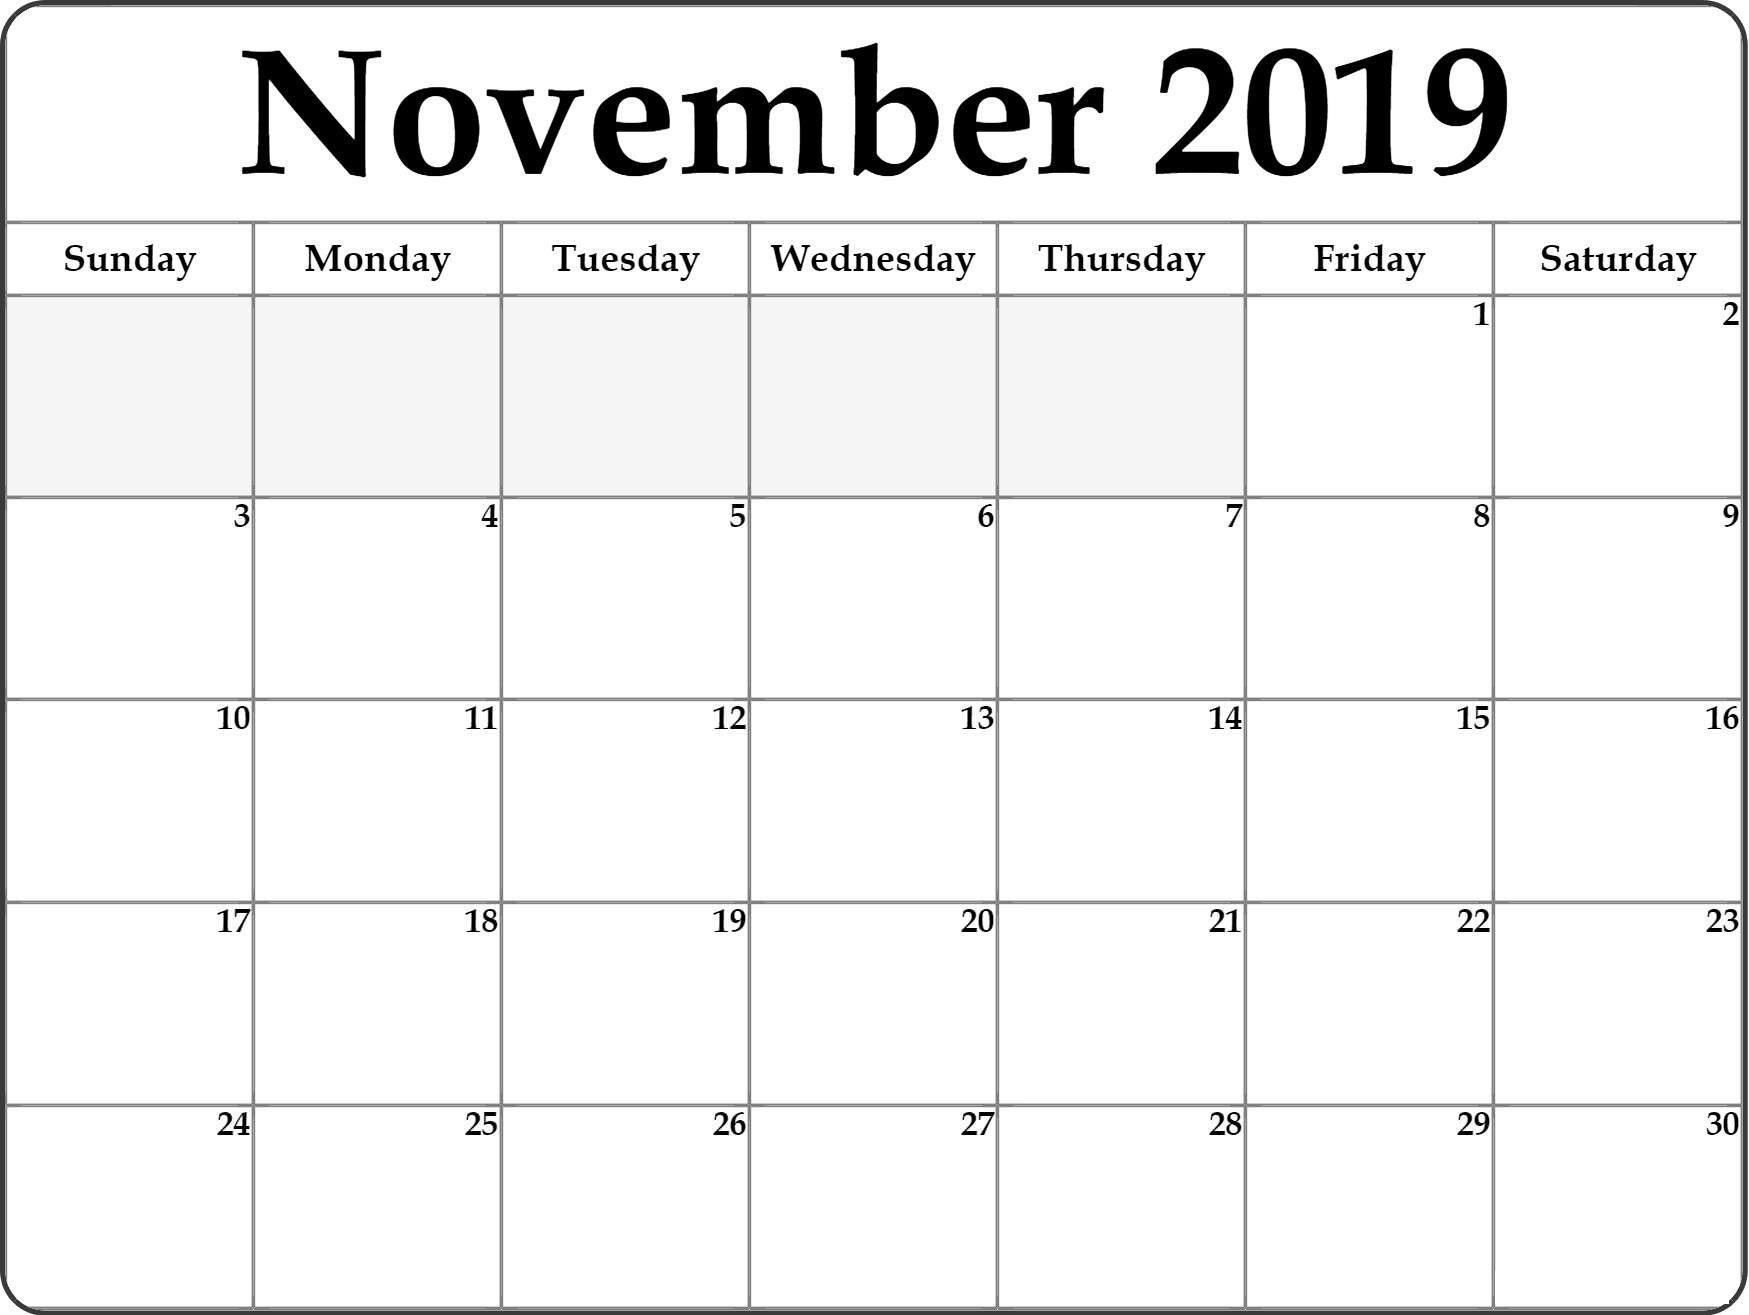 Blank November 2019 Calendar Large Print - Printable